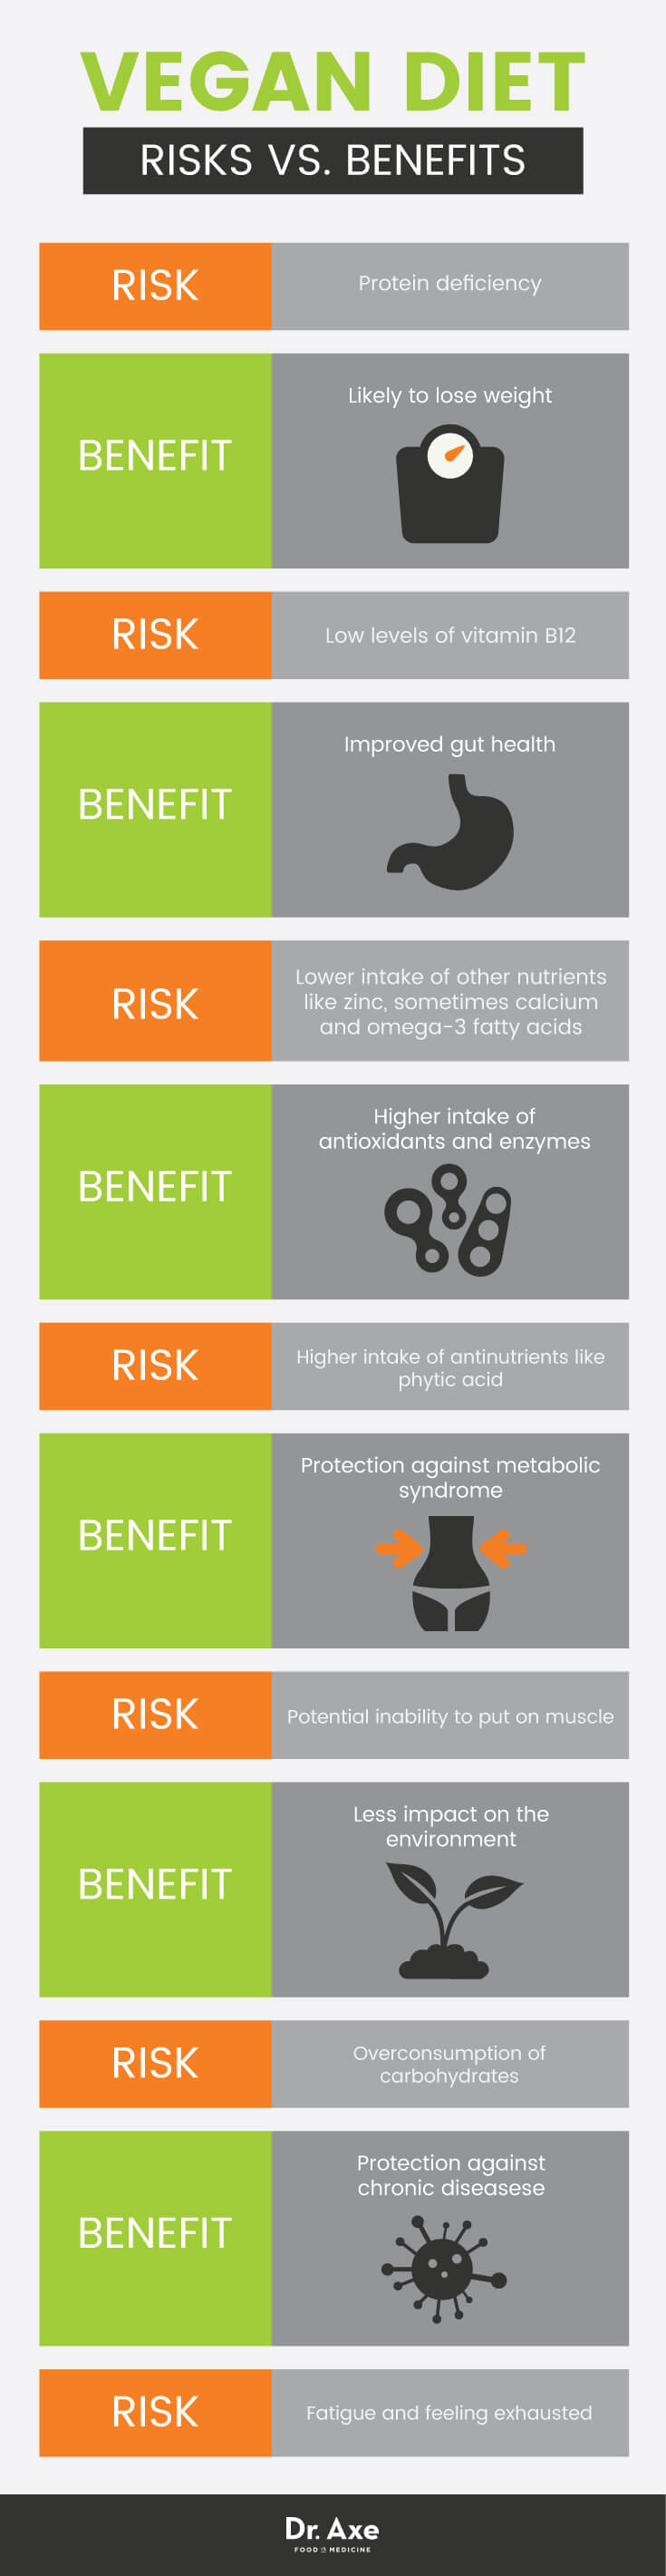 Vegan Diet: Is It An Ultimate Cure Or A Dangerous Trend?